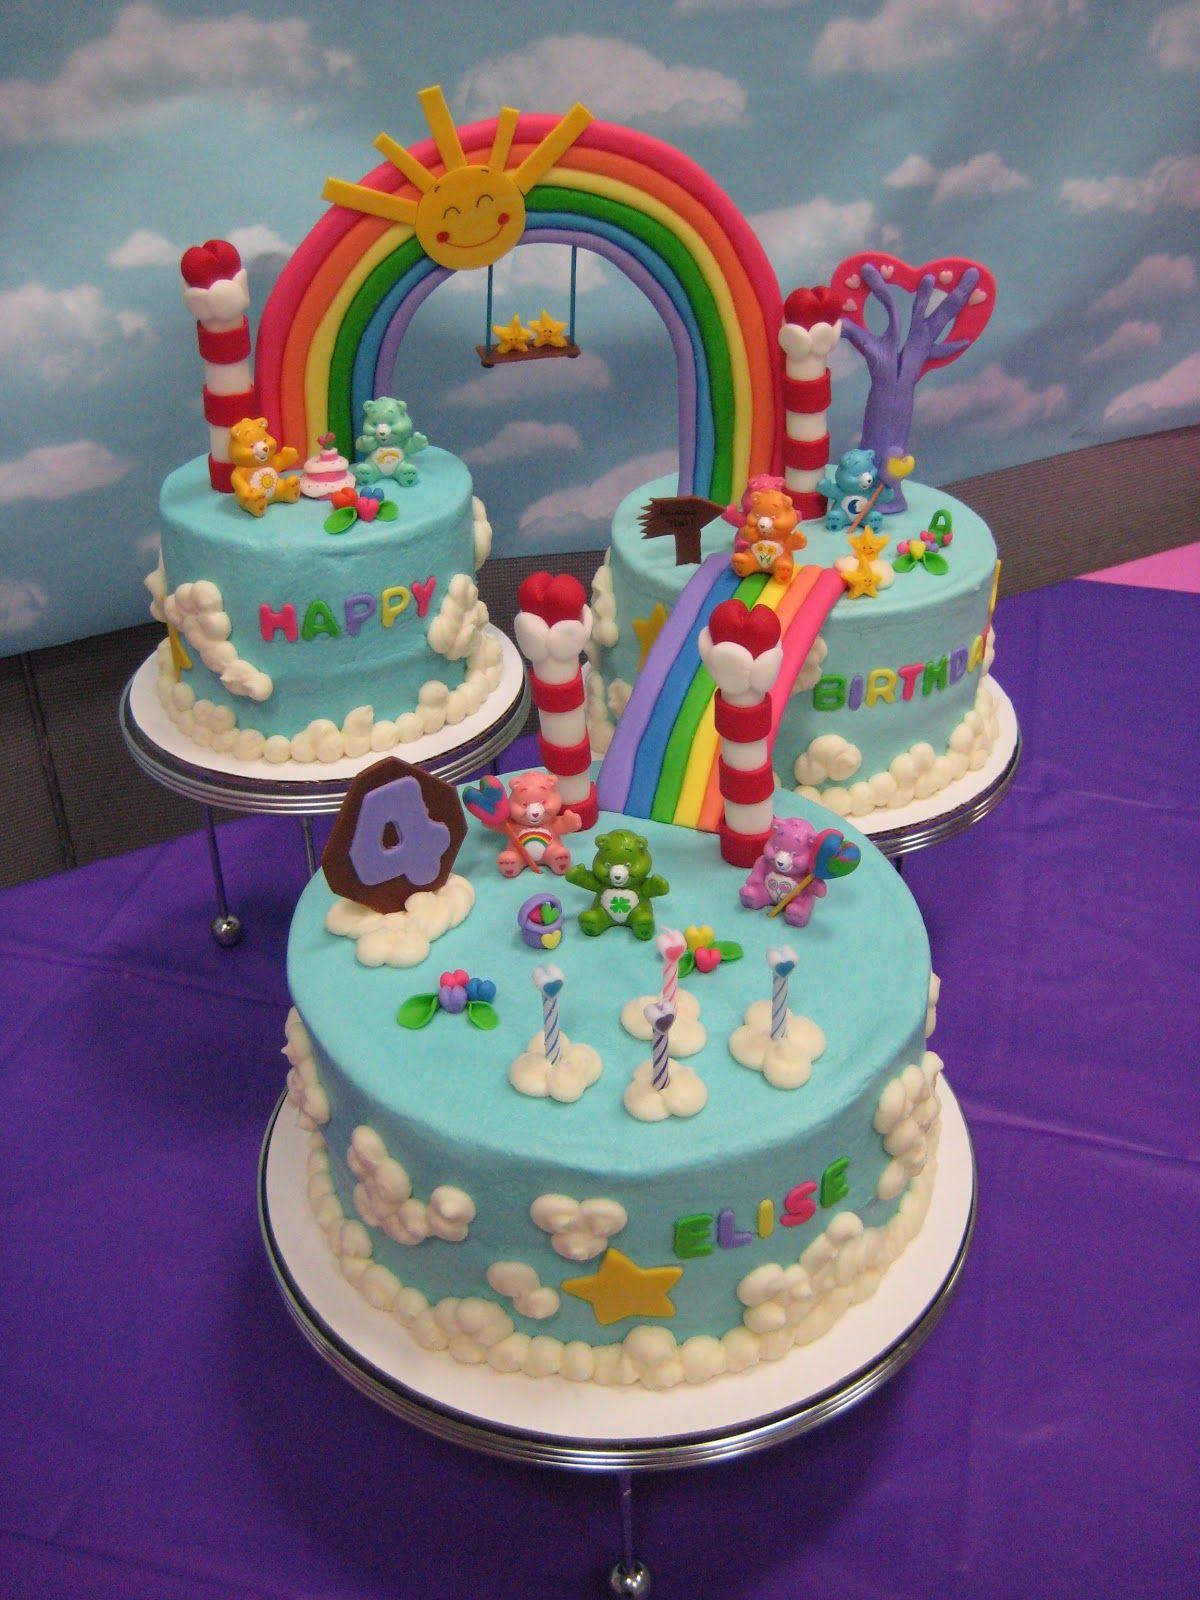 Care Bear Cake Amanda Snelson Snelson Snelson Obryan Creative